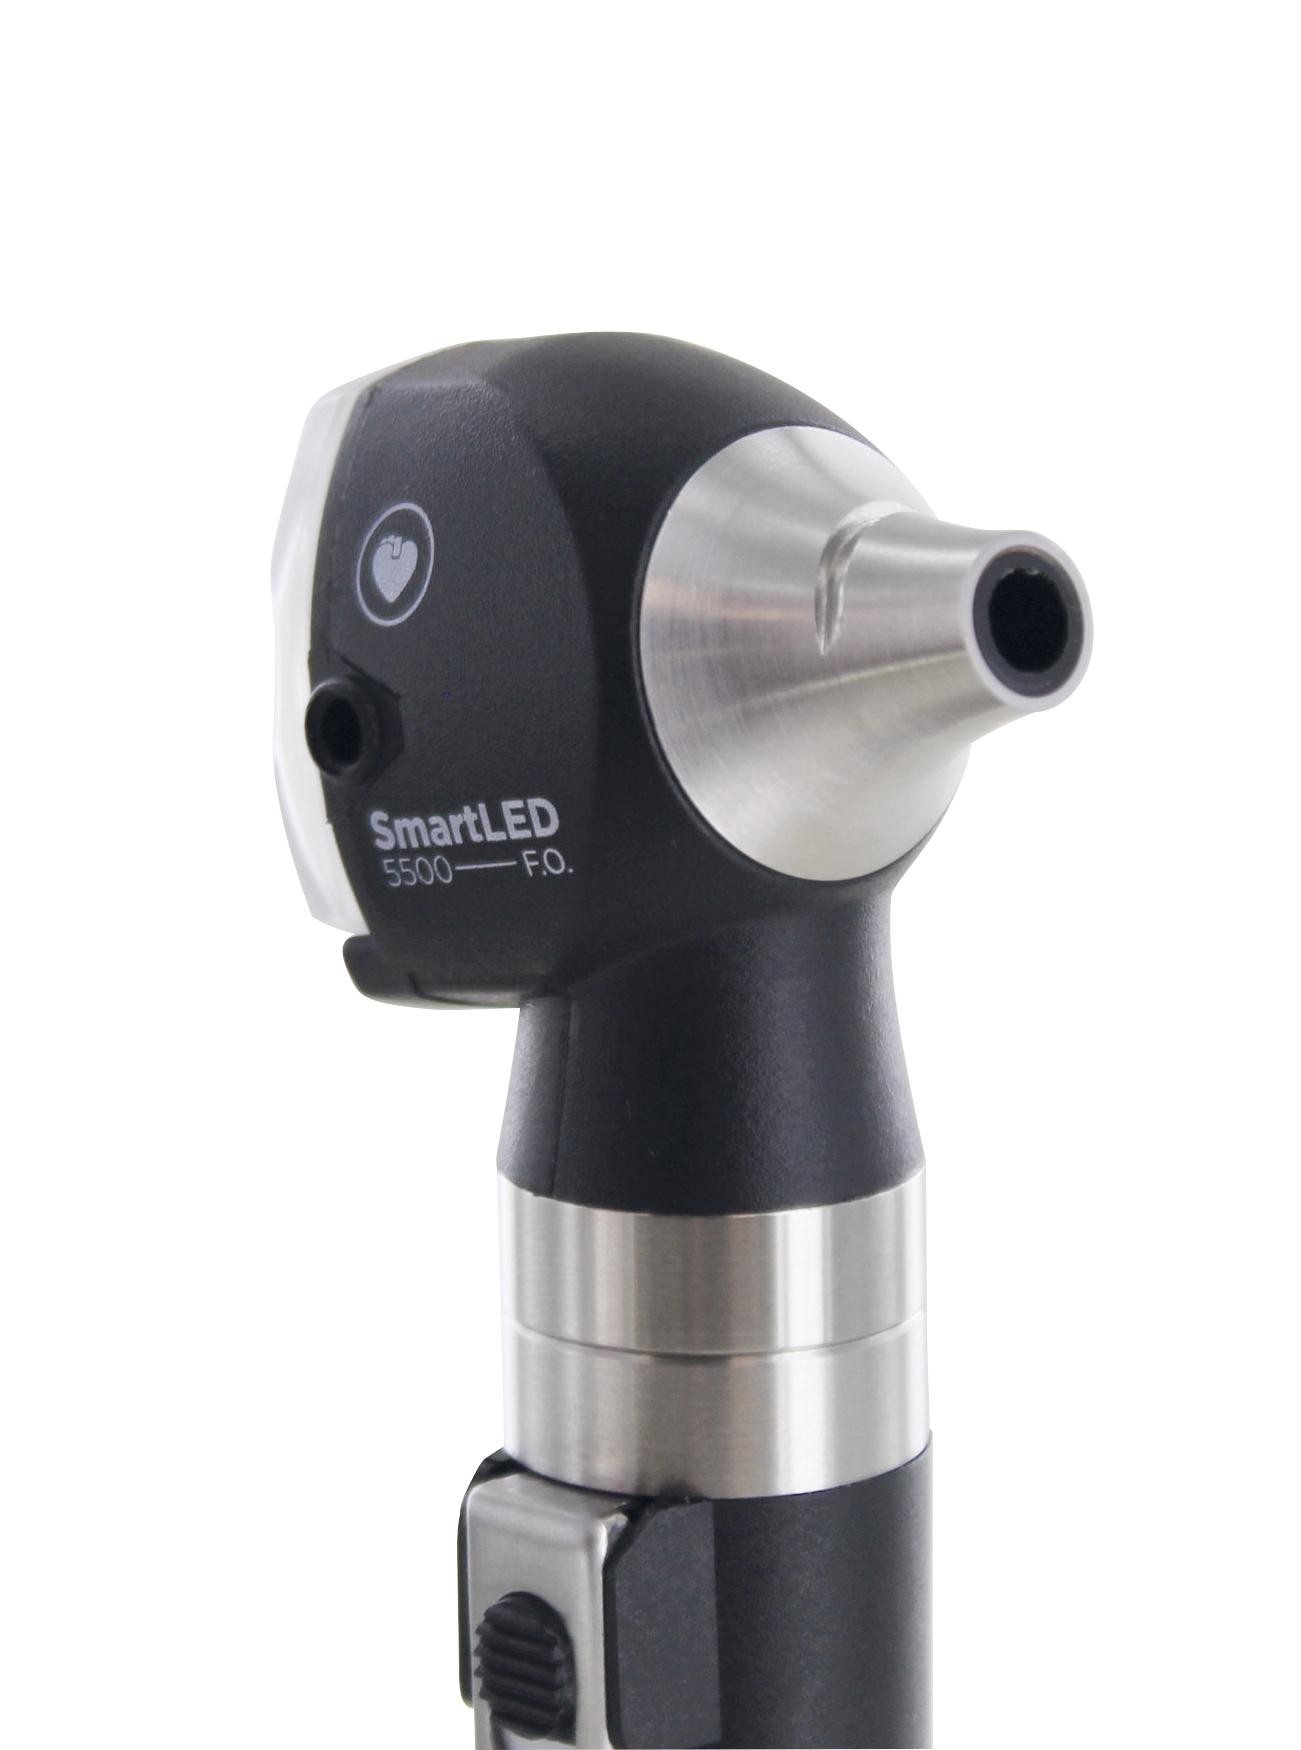 570 517 - otoscope smartled 5500 zoom